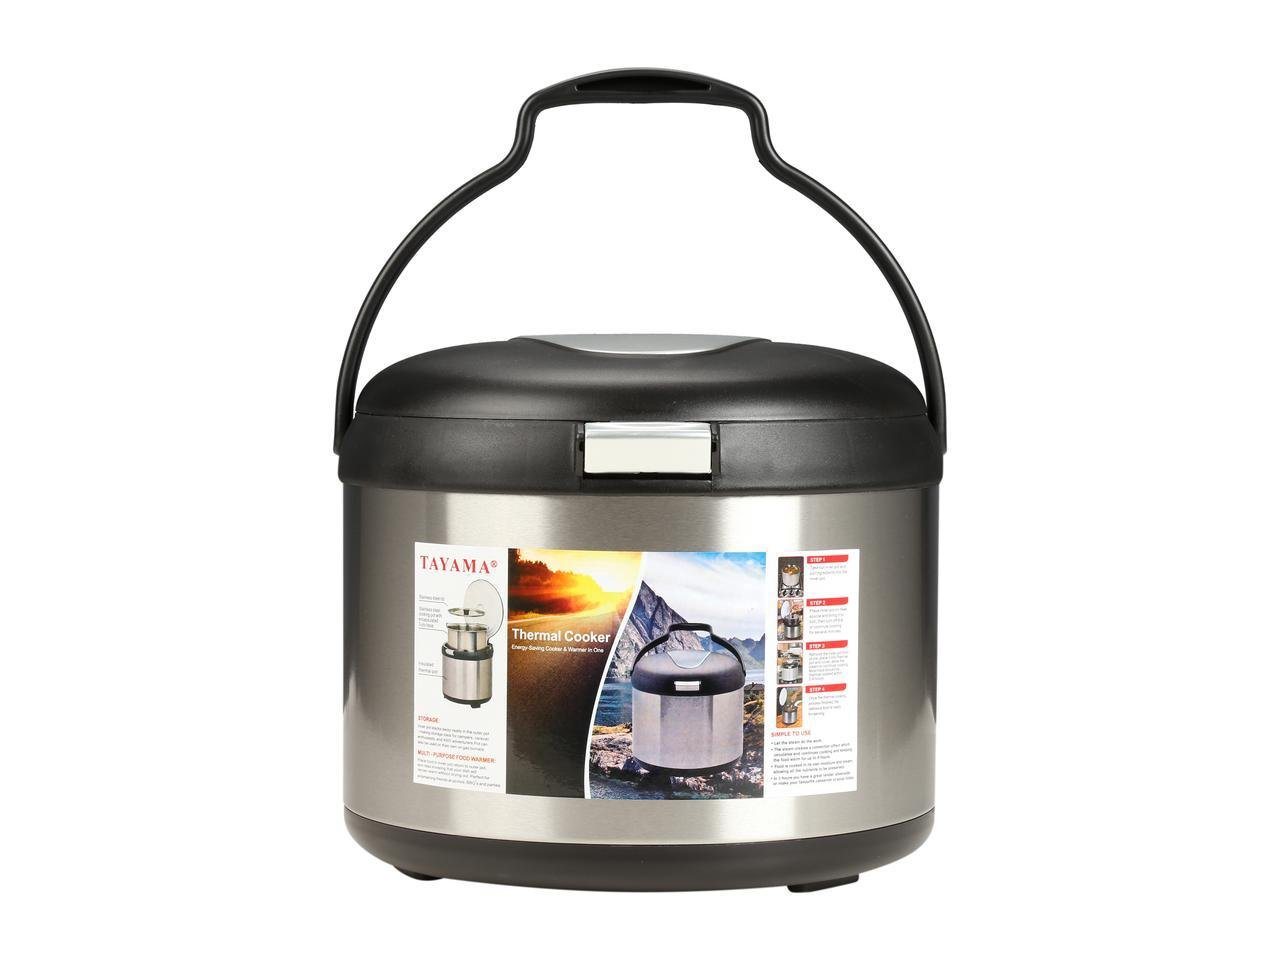 Tayama TXM-50CF Energy-Saving Thermal Cooker, 5 L, Black by TAYAMA (Image #3)